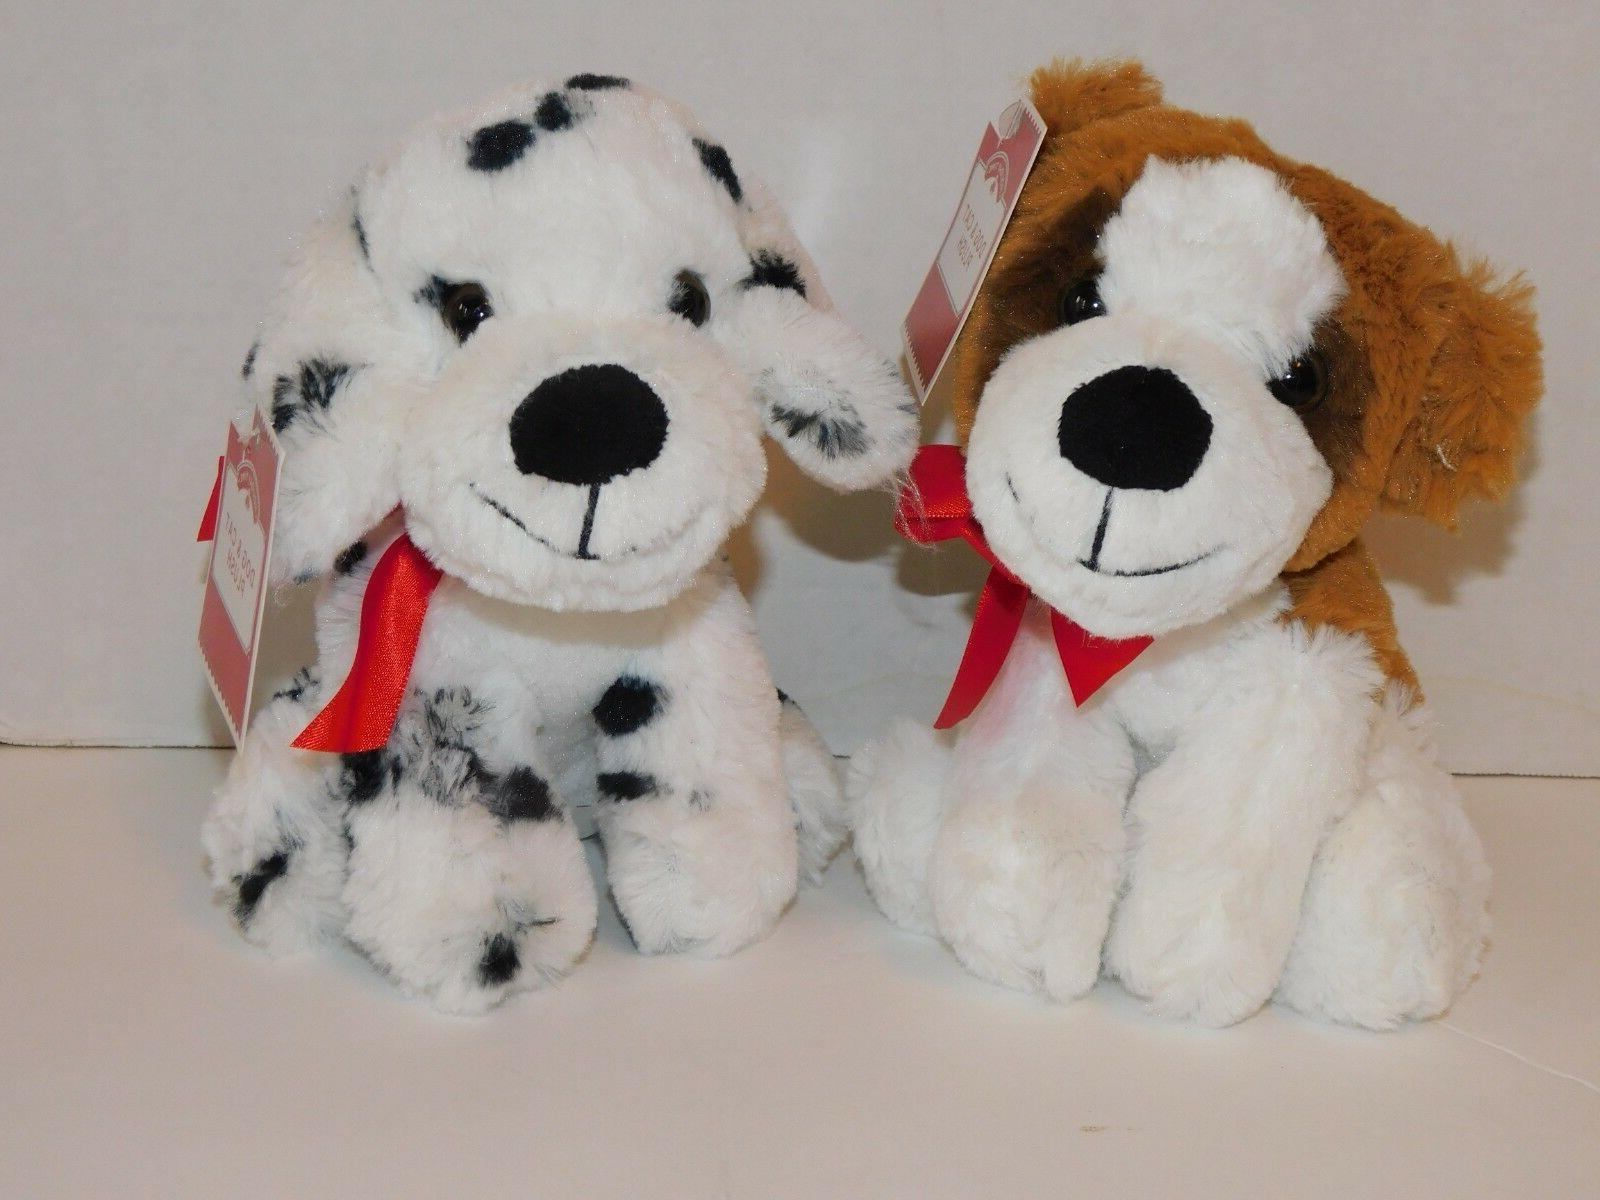 dog puppy plush stuffed animals st bernard